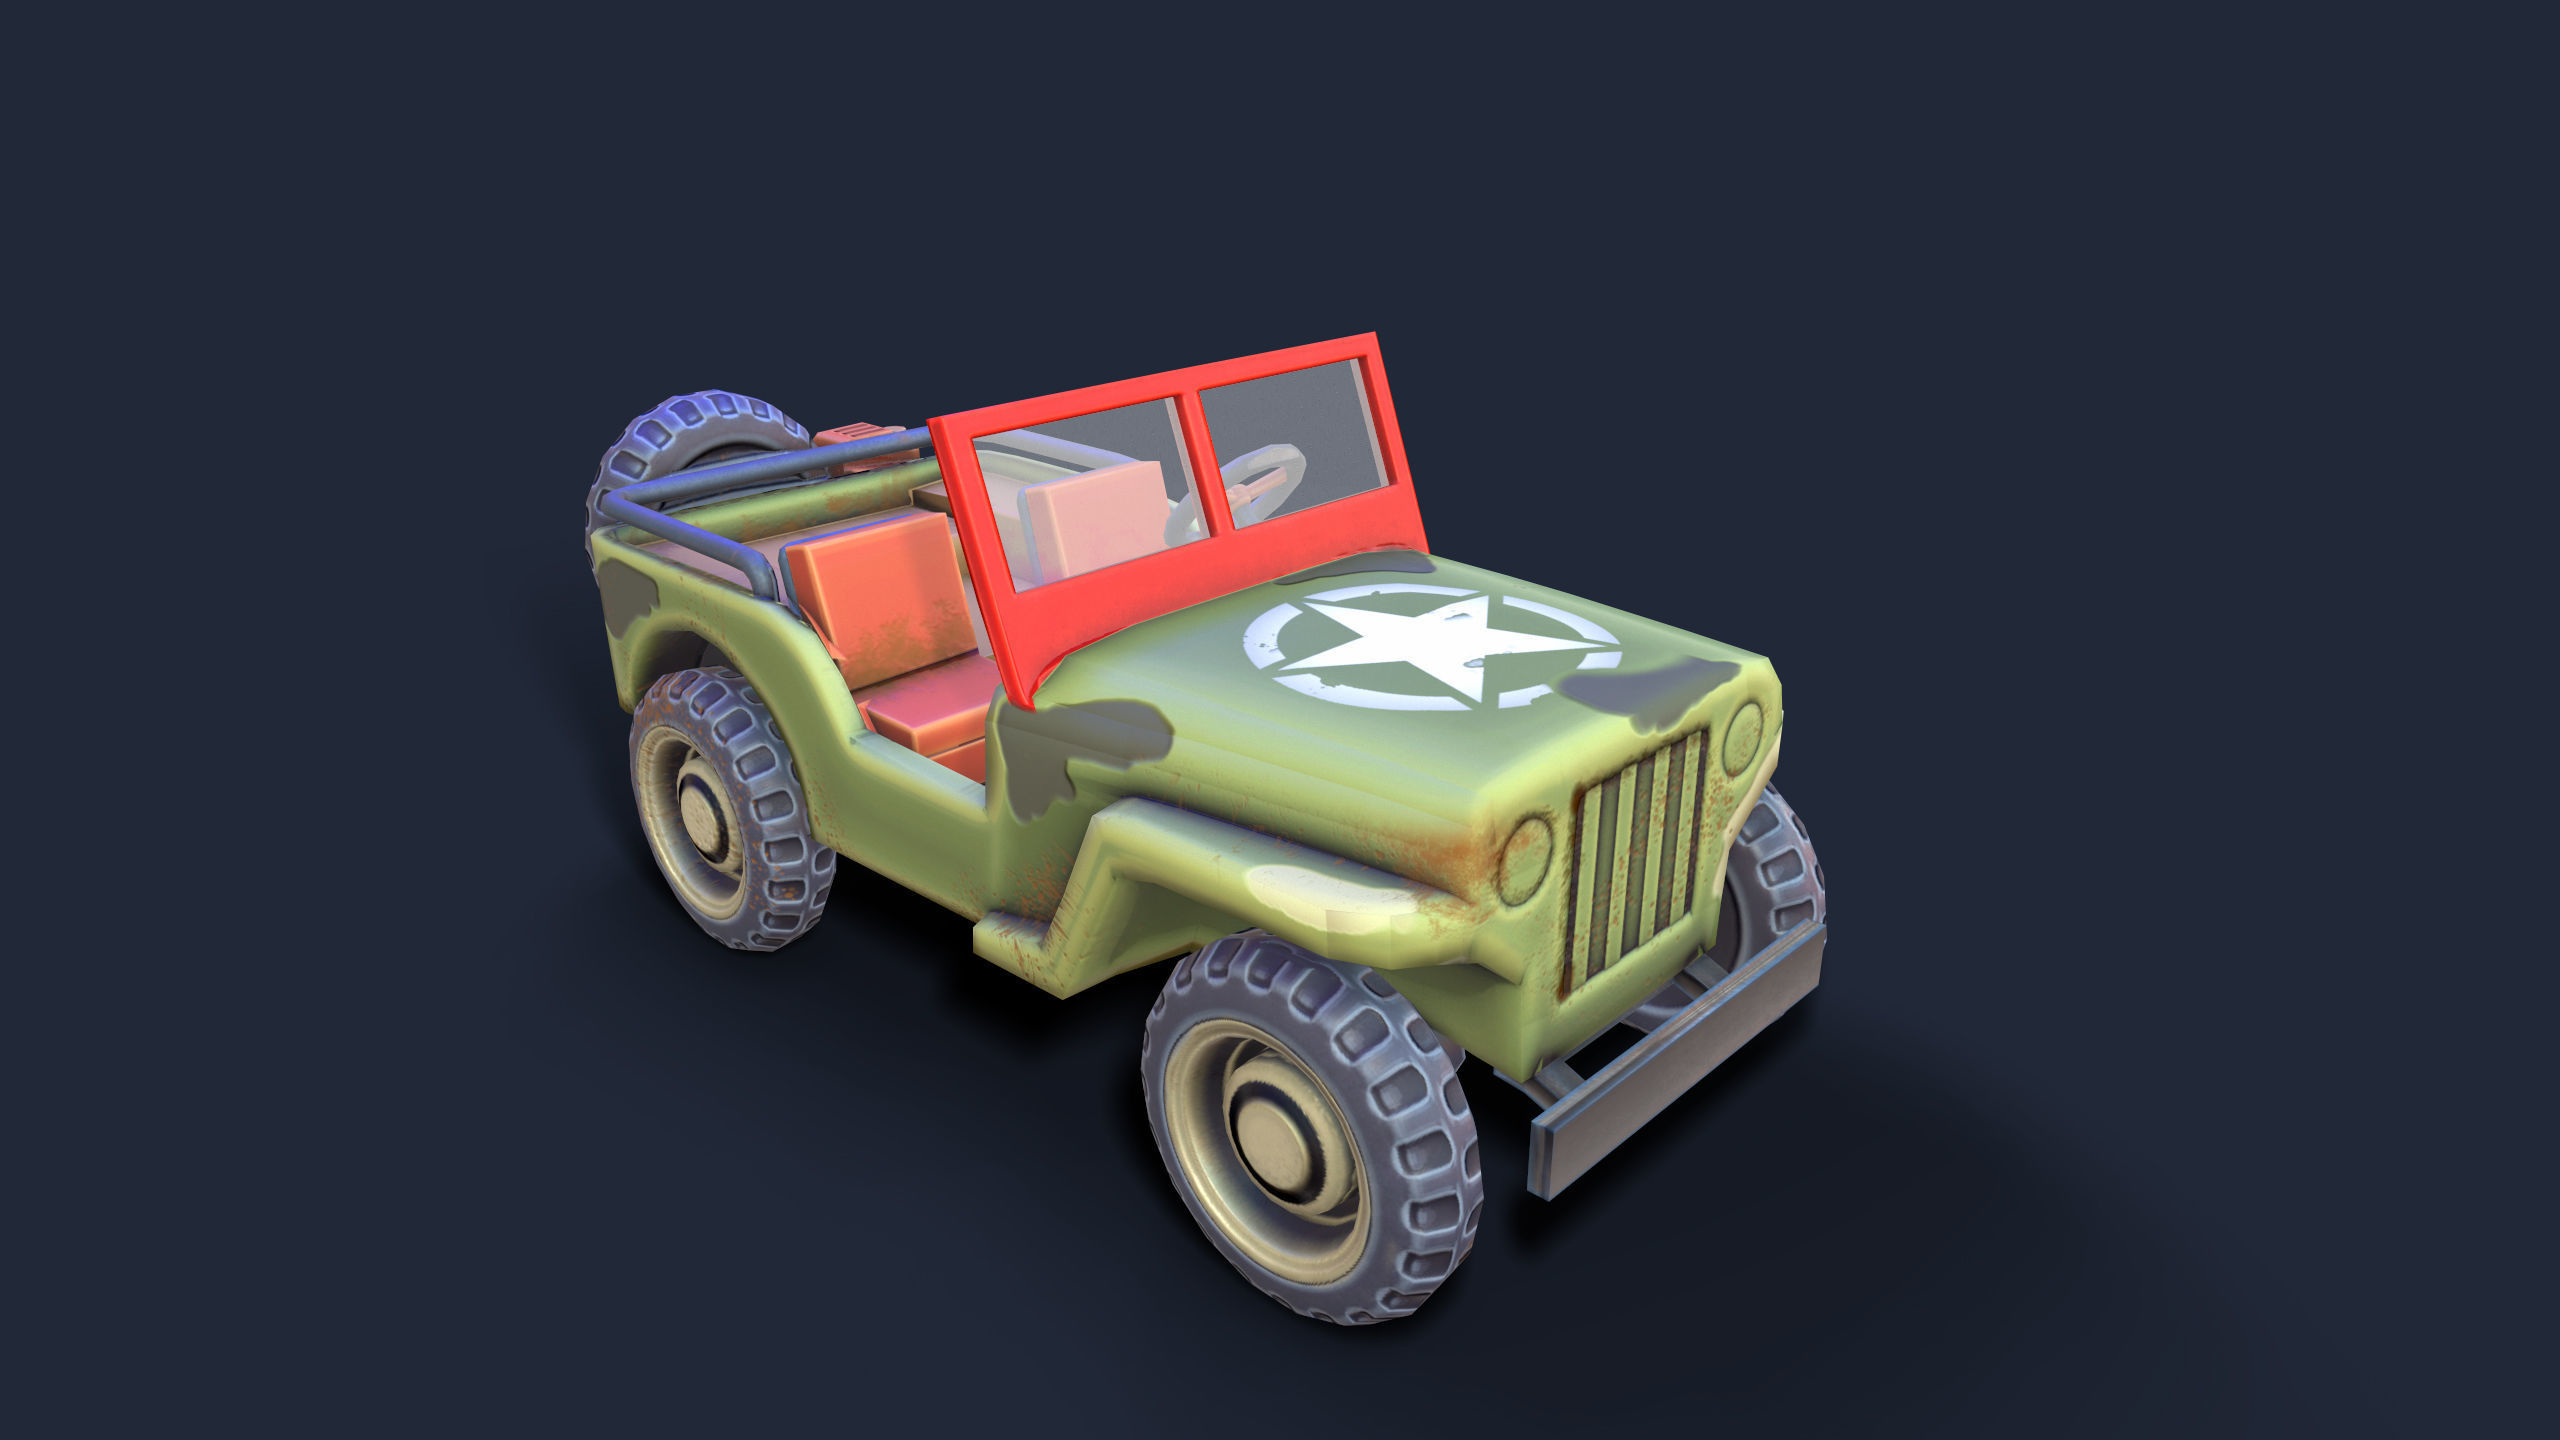 Lowpoly cartoon PBR WW2 army jeep vehicle